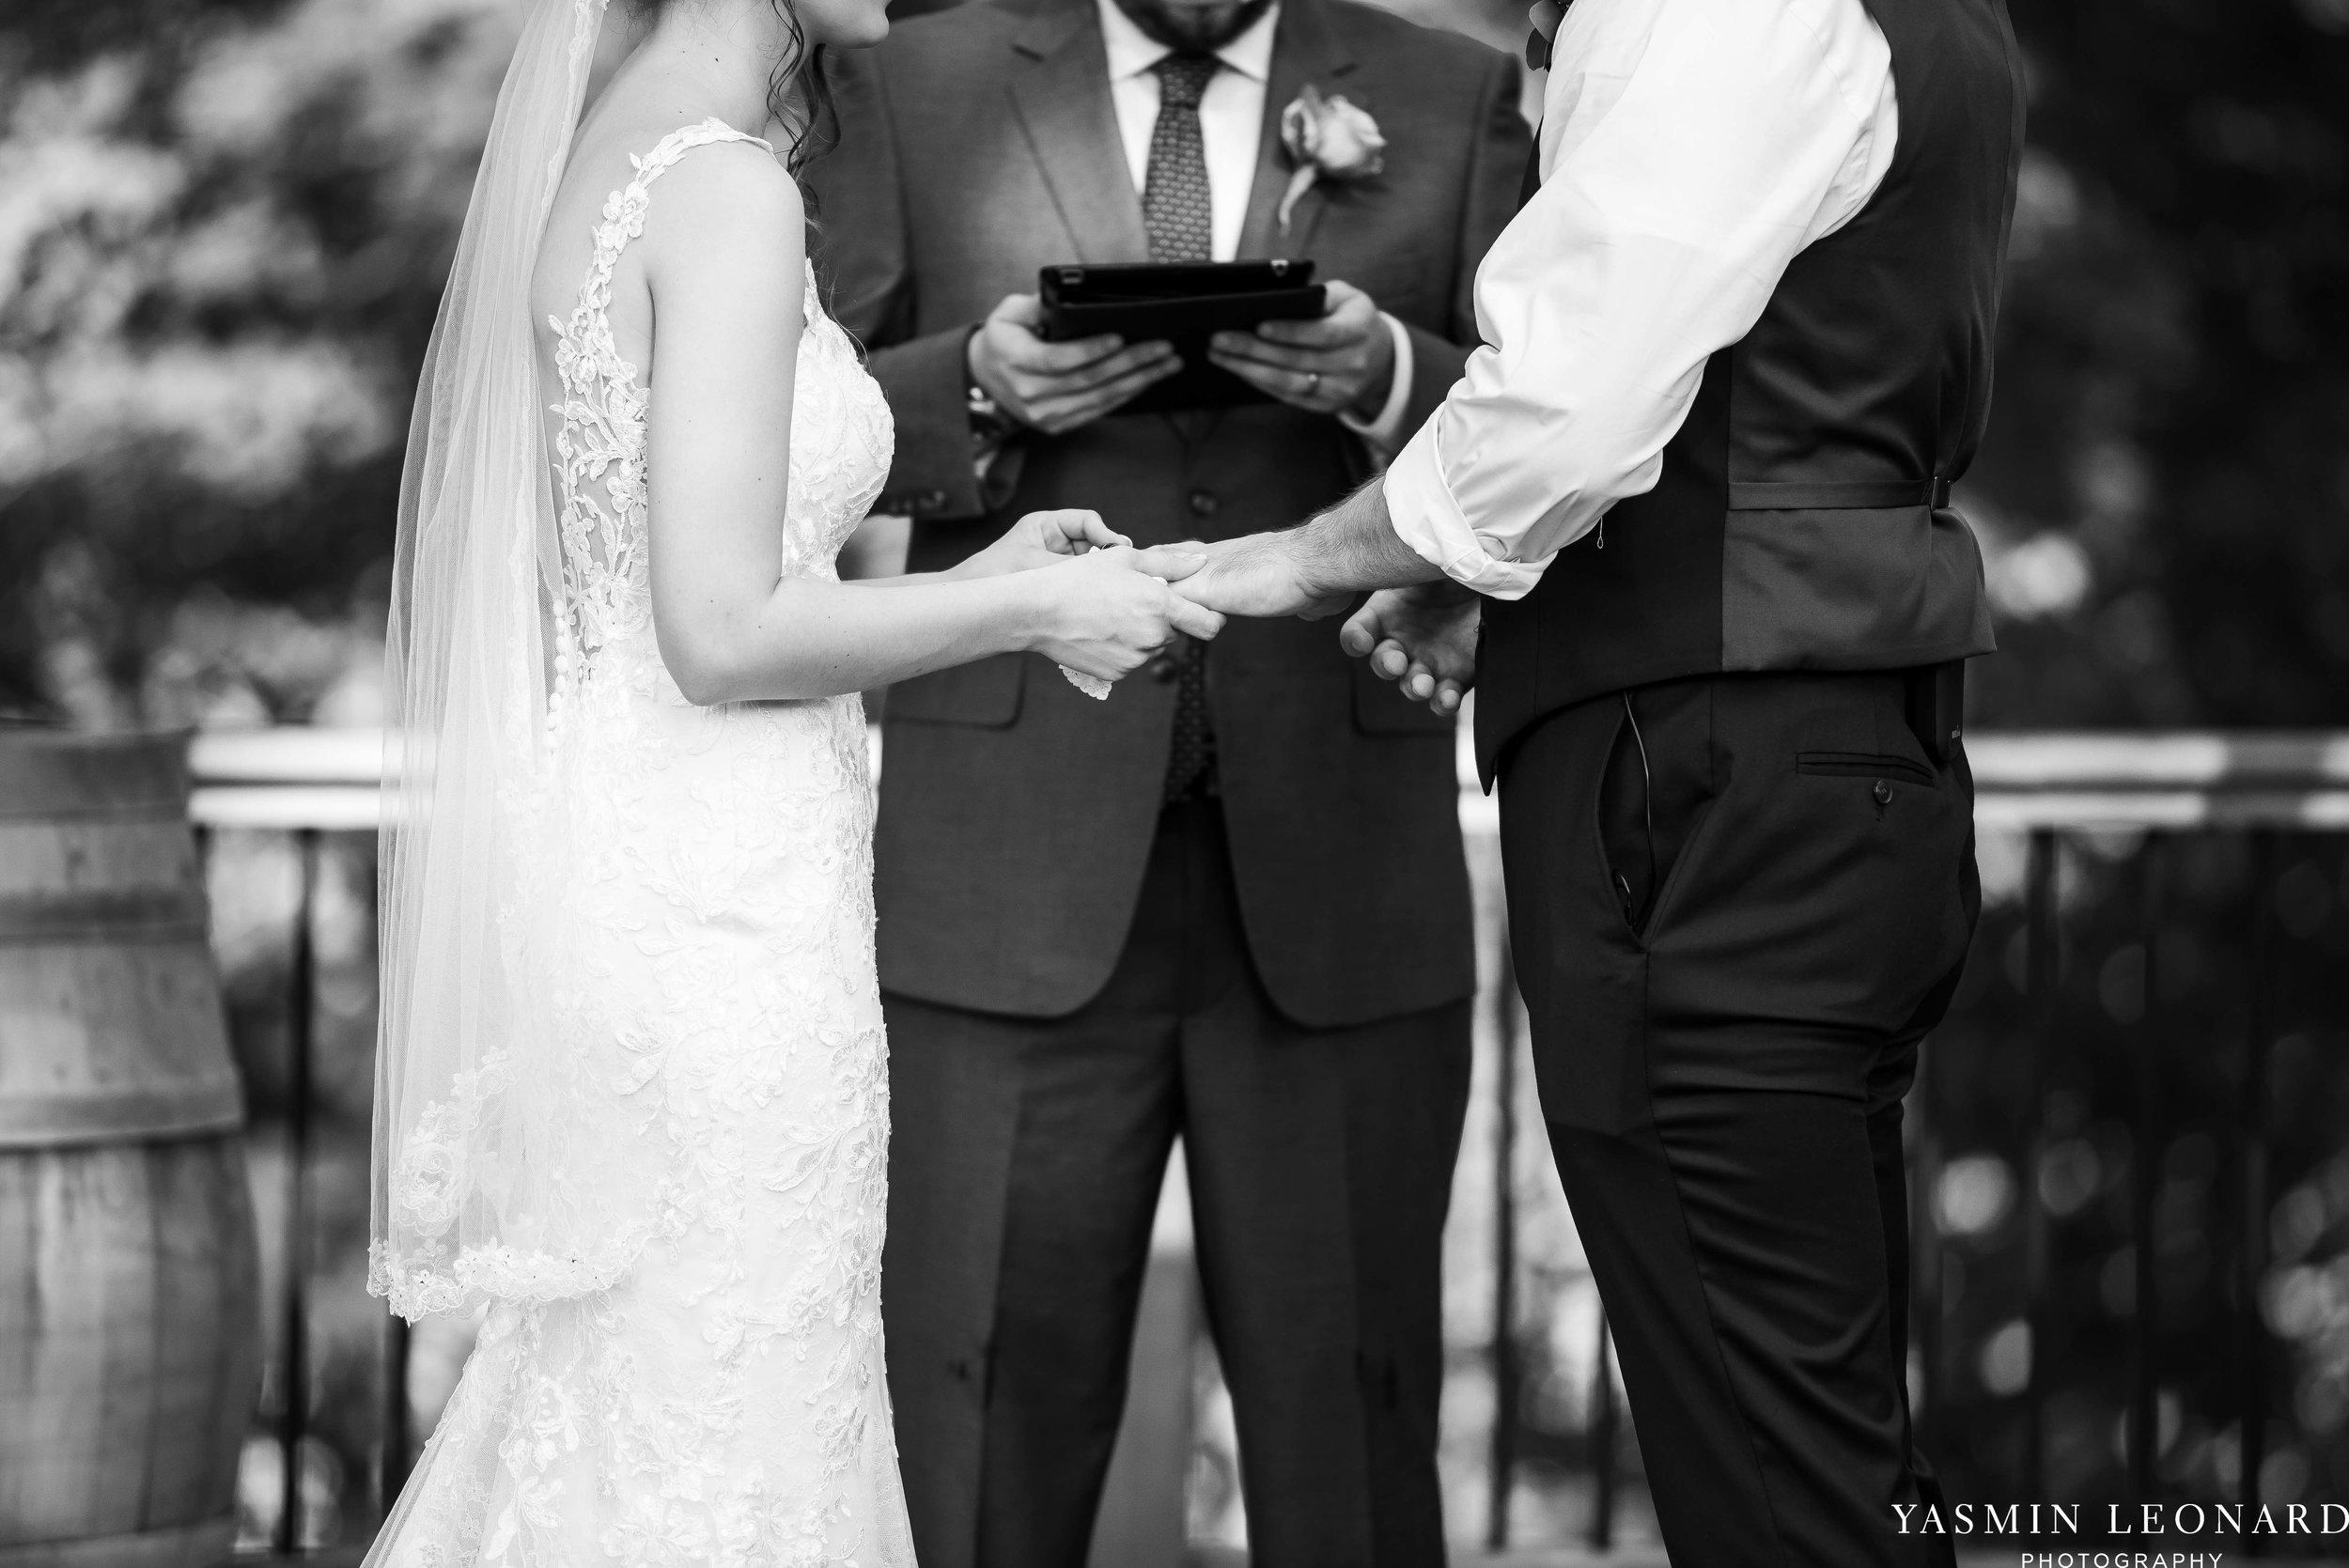 Old Homeplace Vineyard - NC Weddings - Outdoor Summer Weddings - Peony Boutique - Vineyard Wedding - NC Photographer - Yasmin Leonard Photography-31.jpg